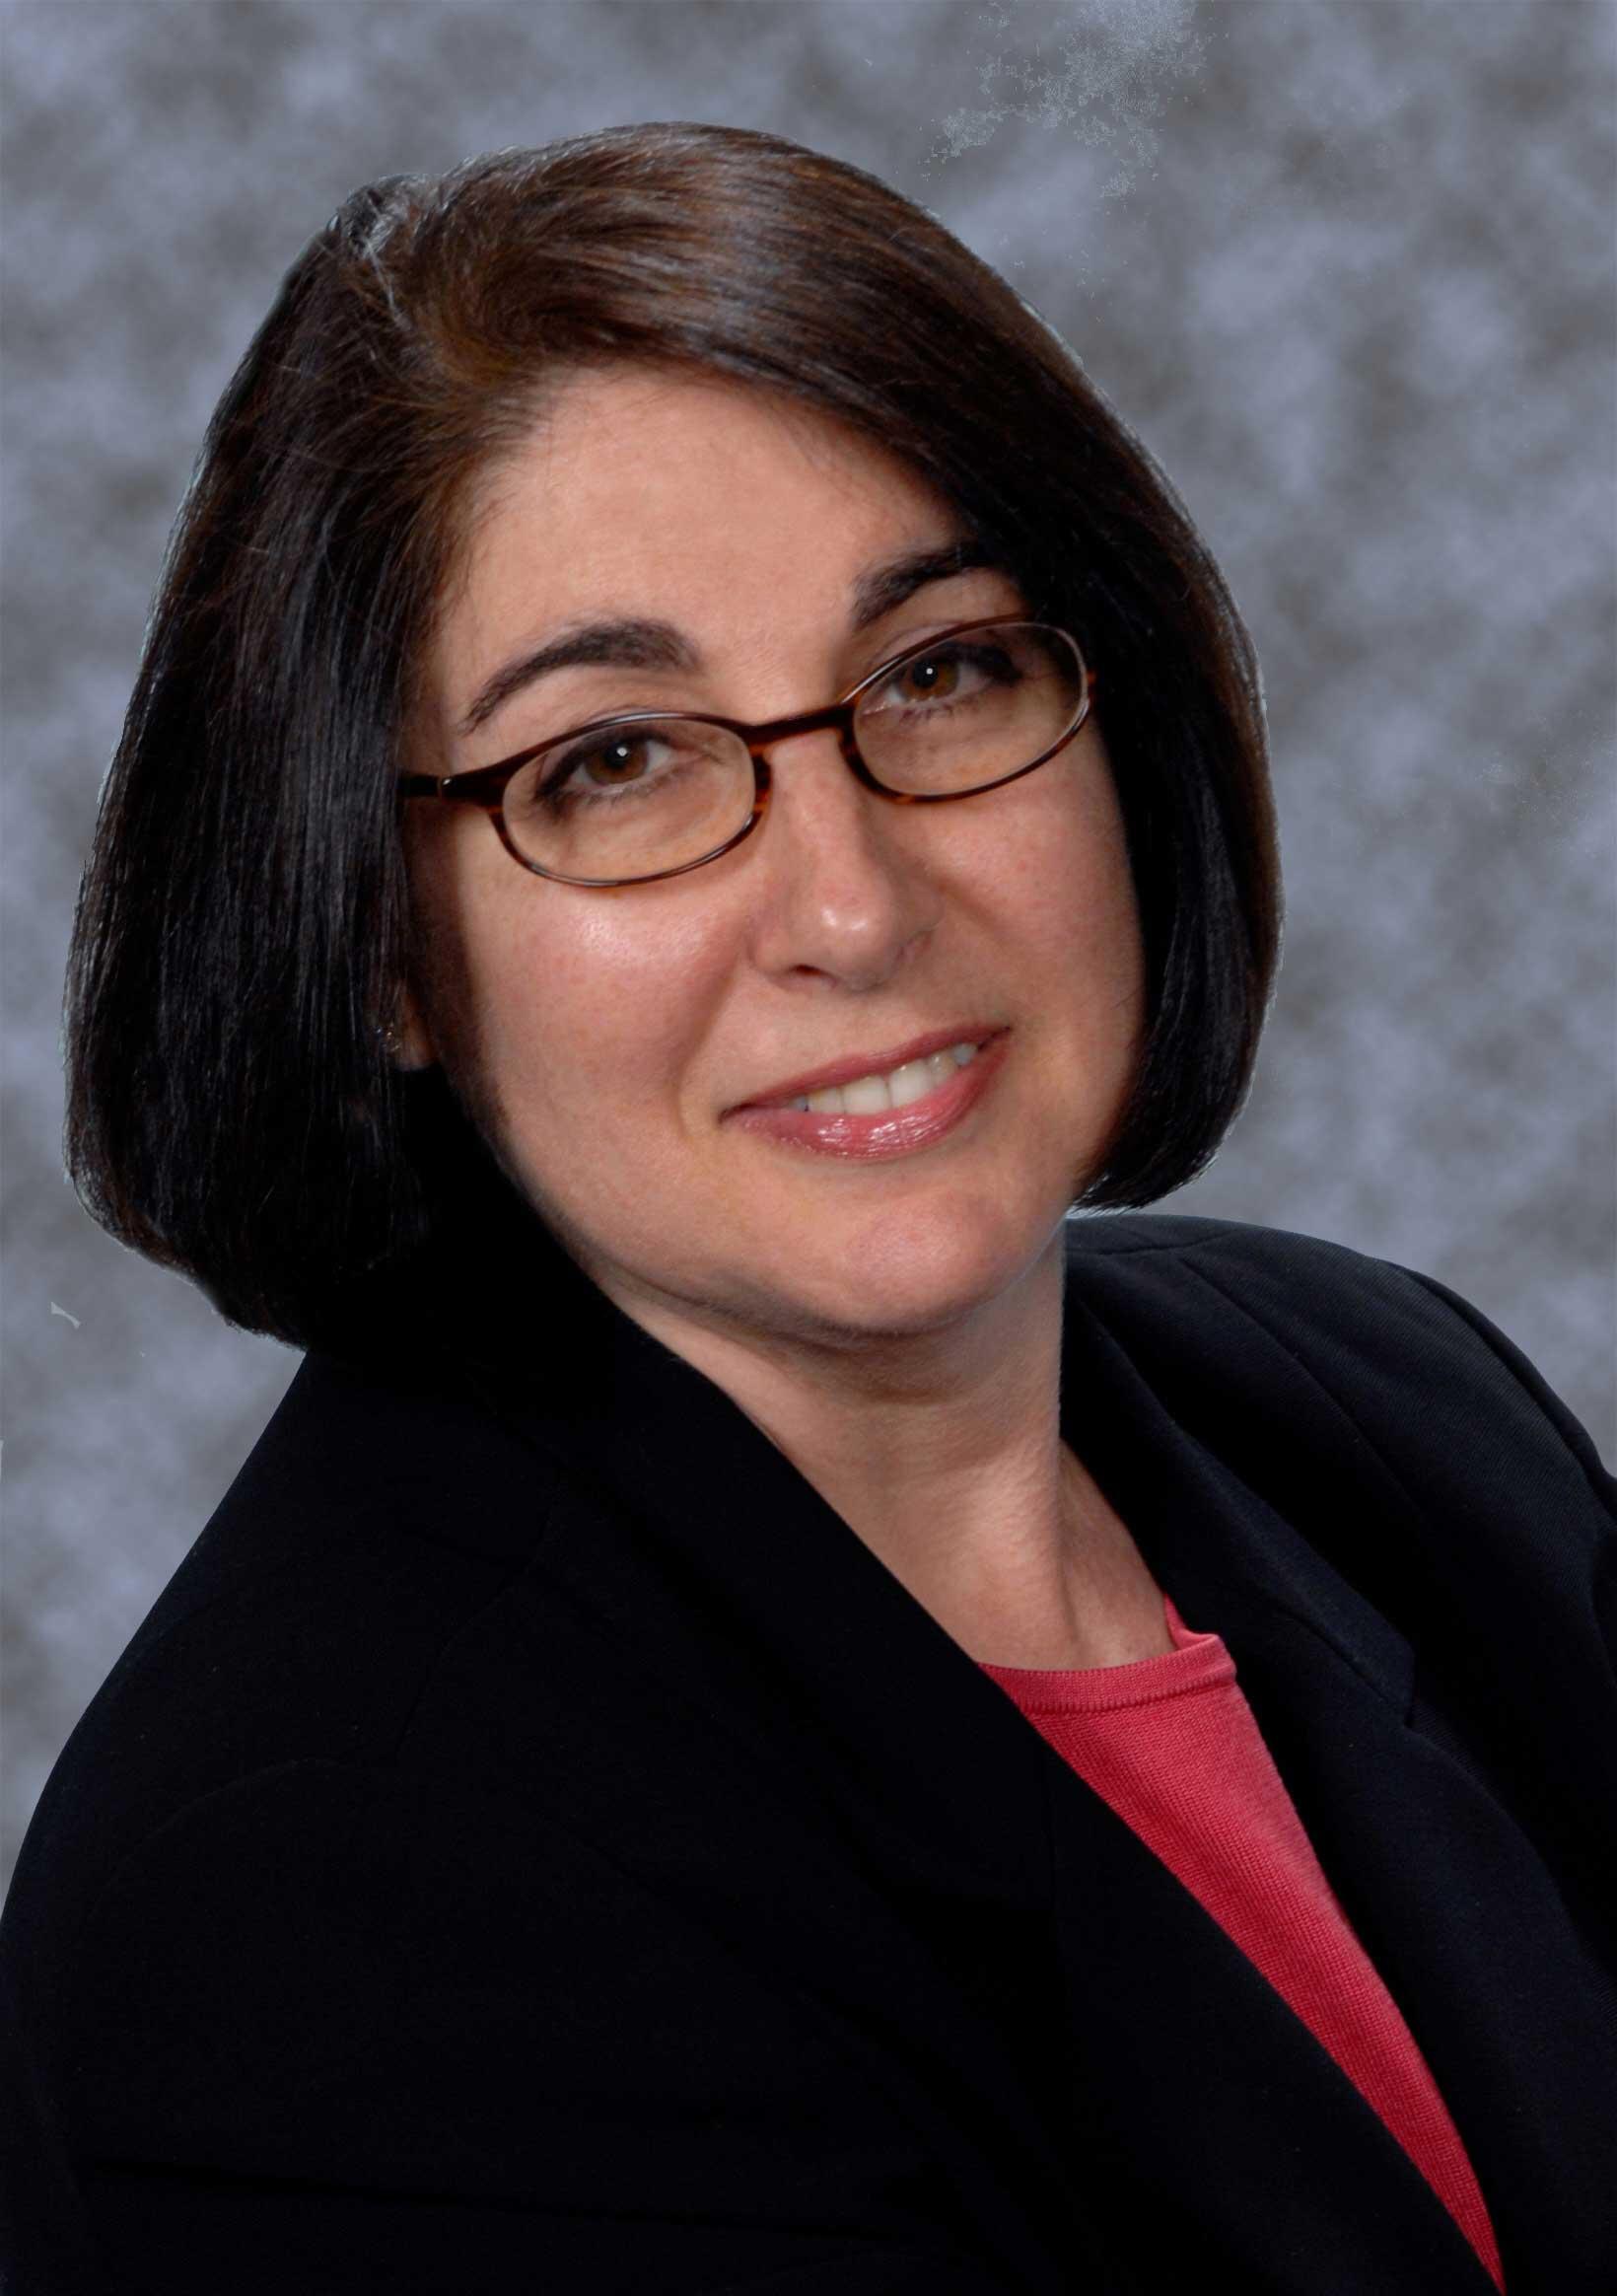 Sharon Kantor Bogetz